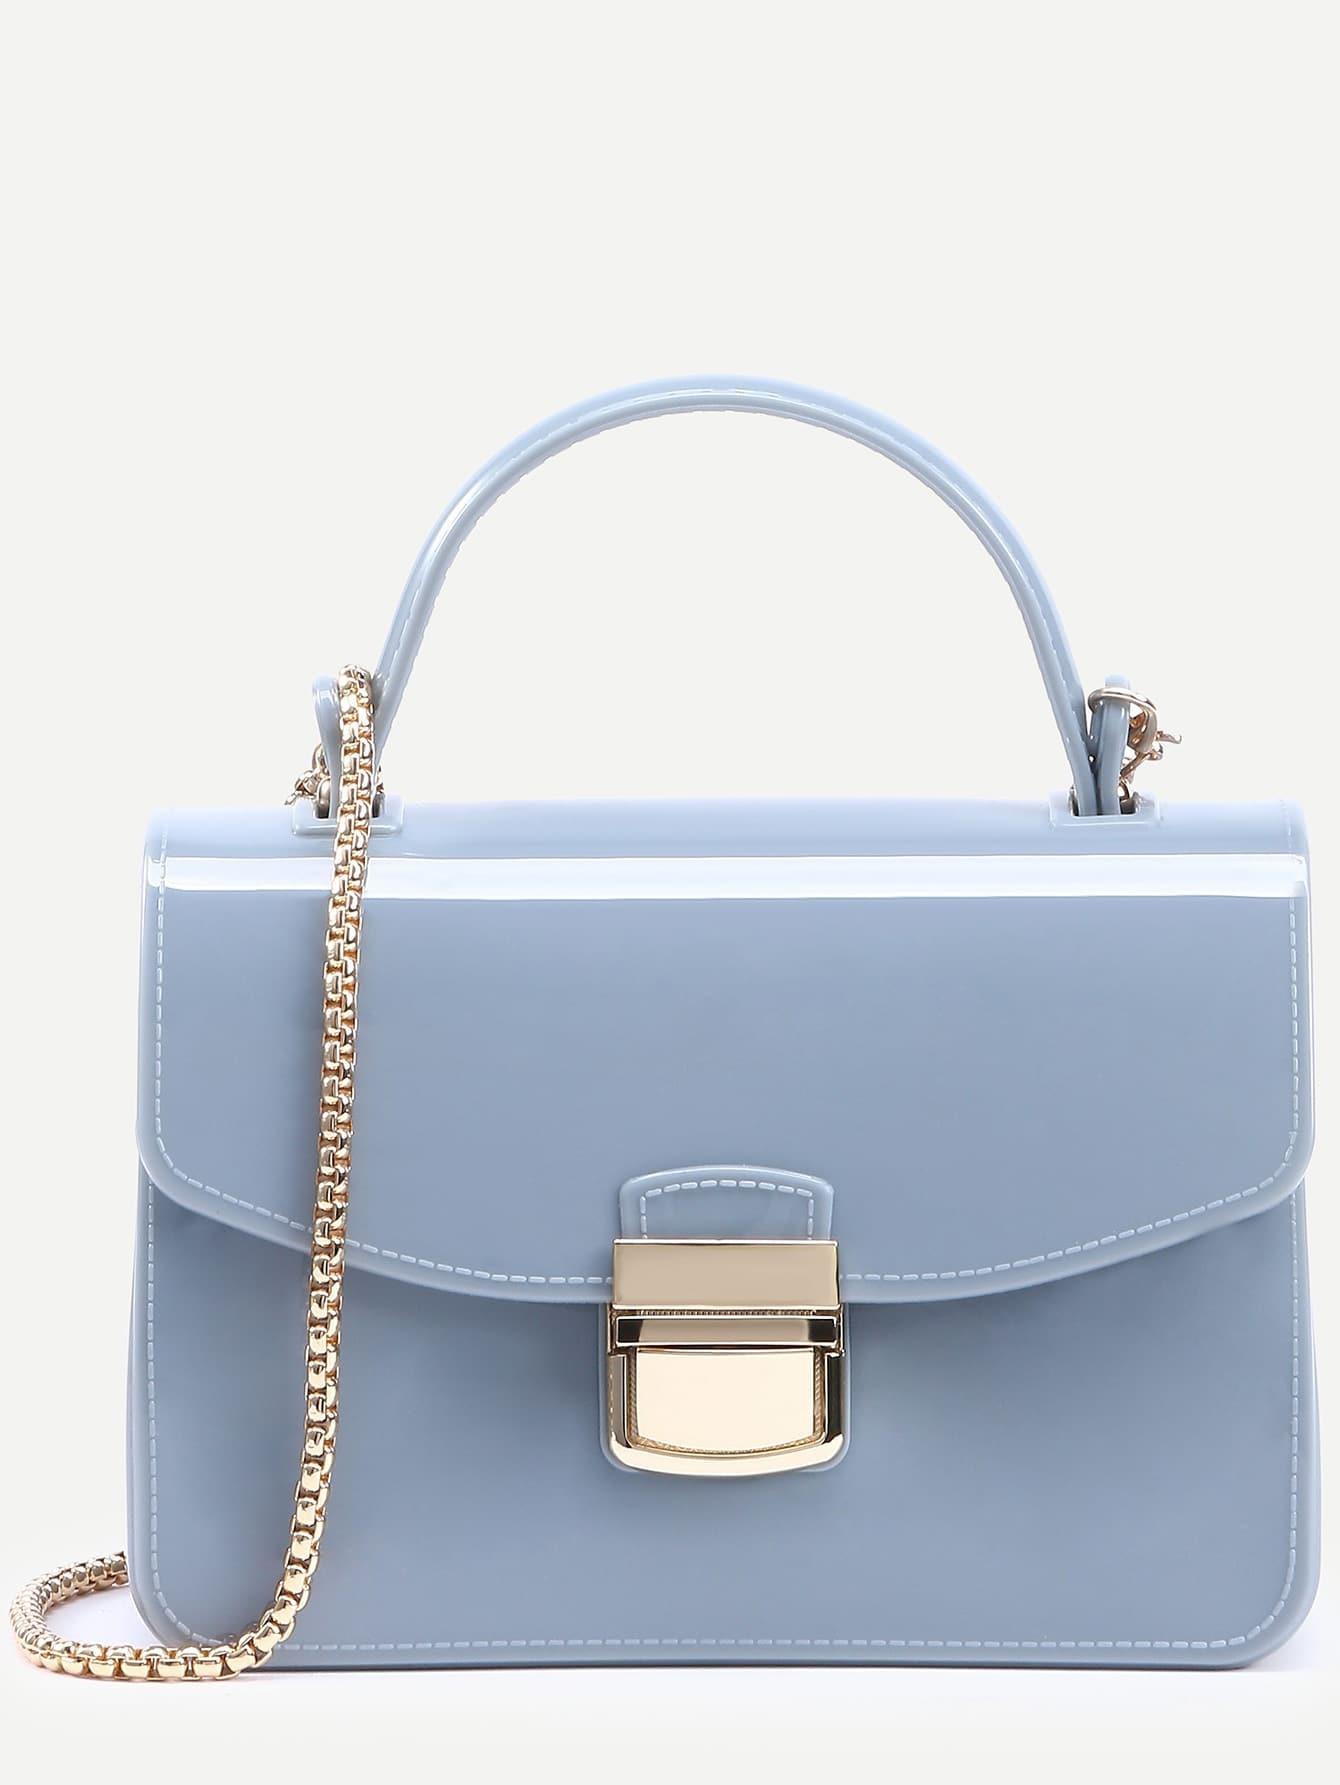 daa9bbb8b1 Baby Blue Pushlock Closure Plastic Handbag With Chain EmmaCloth ...